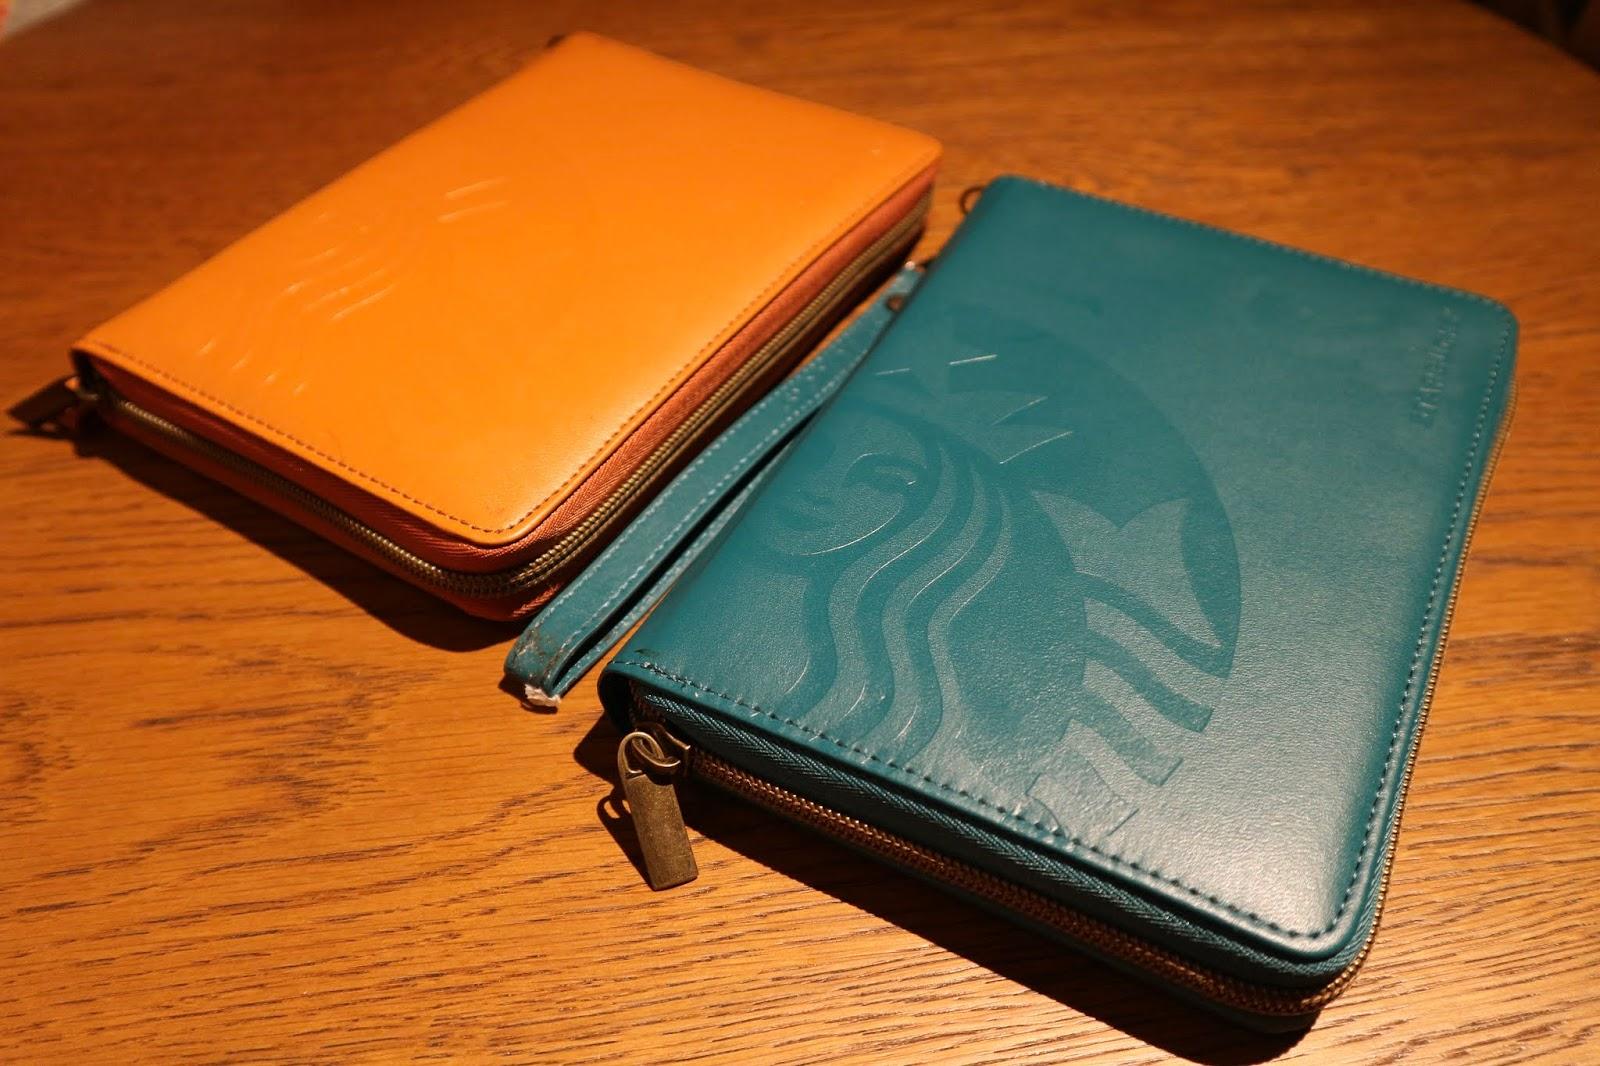 Starbucks 2019 Travel Organizer